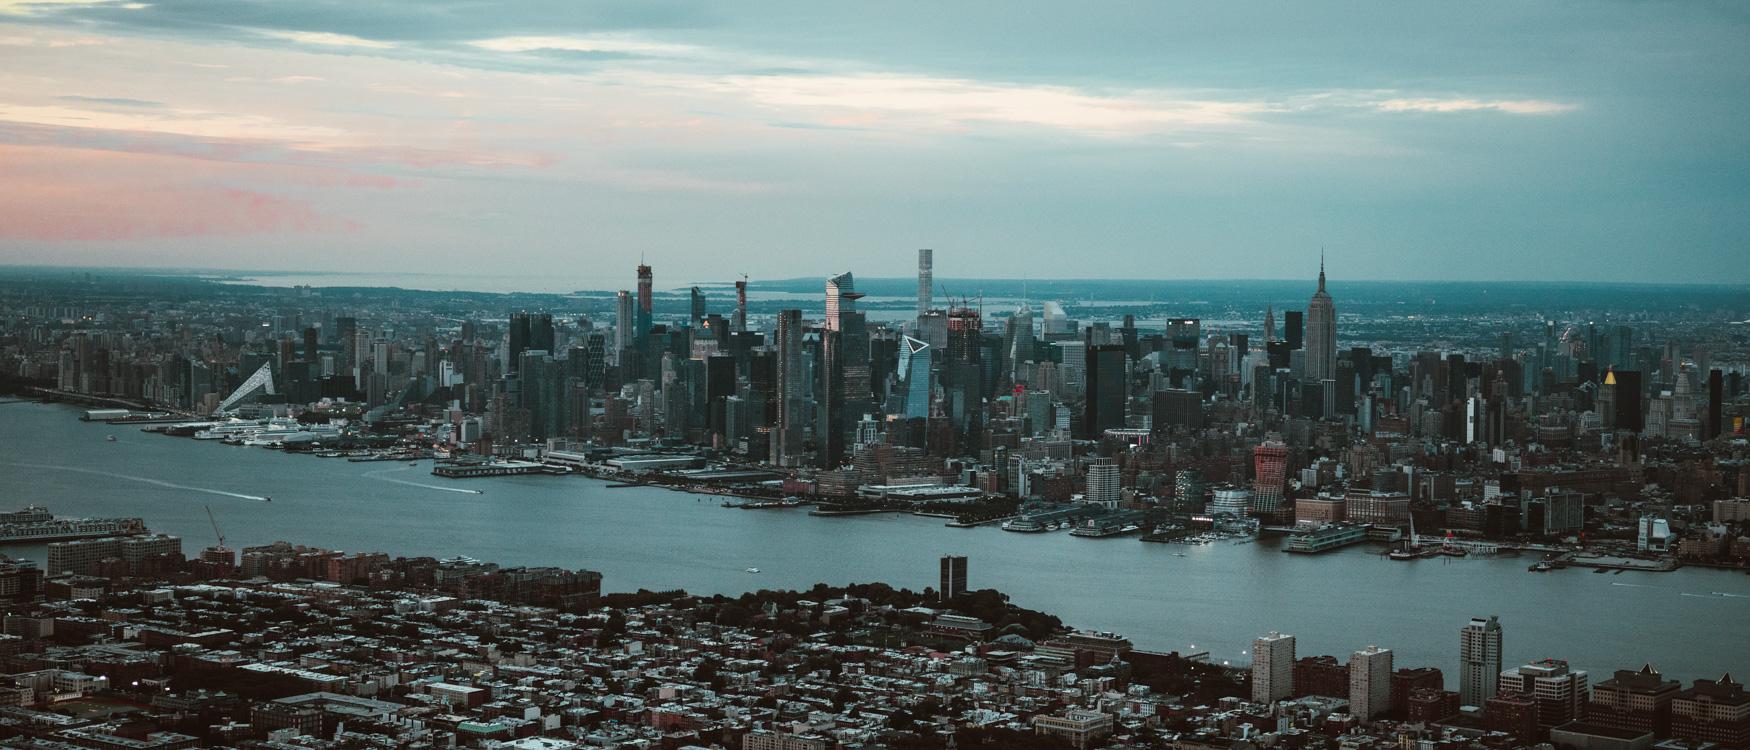 helikopterflug-new-york-aussicht